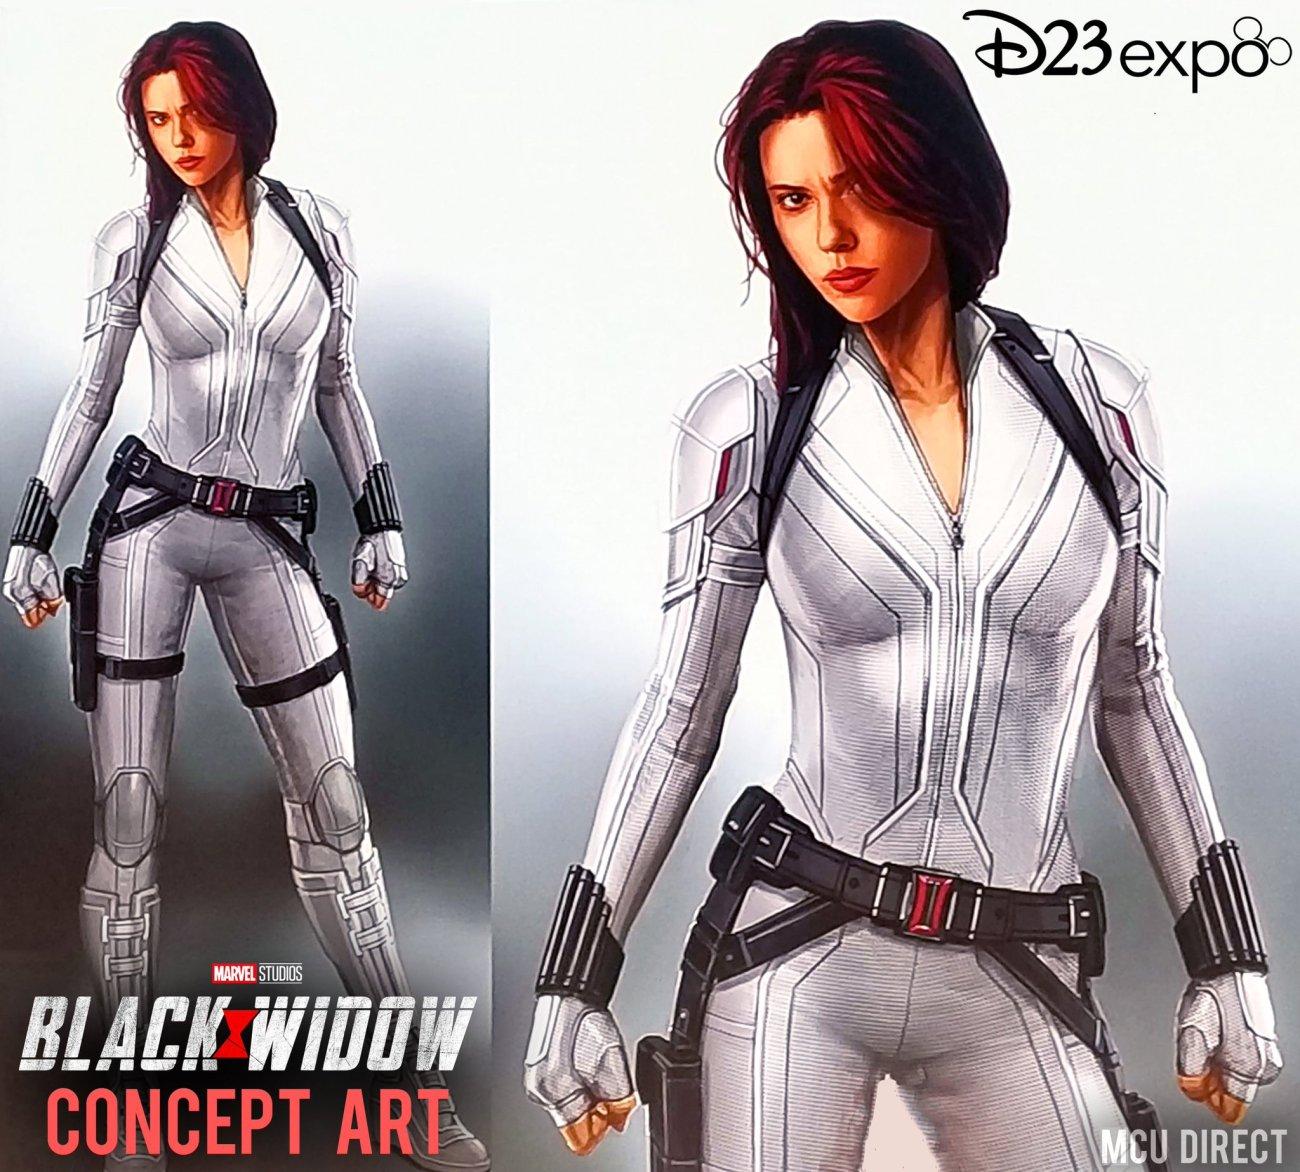 Arte conceptual del traje de Black Widow/Natasha Romanoff (Scarlett Johansson) en Black Widow (2020) por Andy Park. Imagen: MCU Direct Twitter (@MCU_Direct).